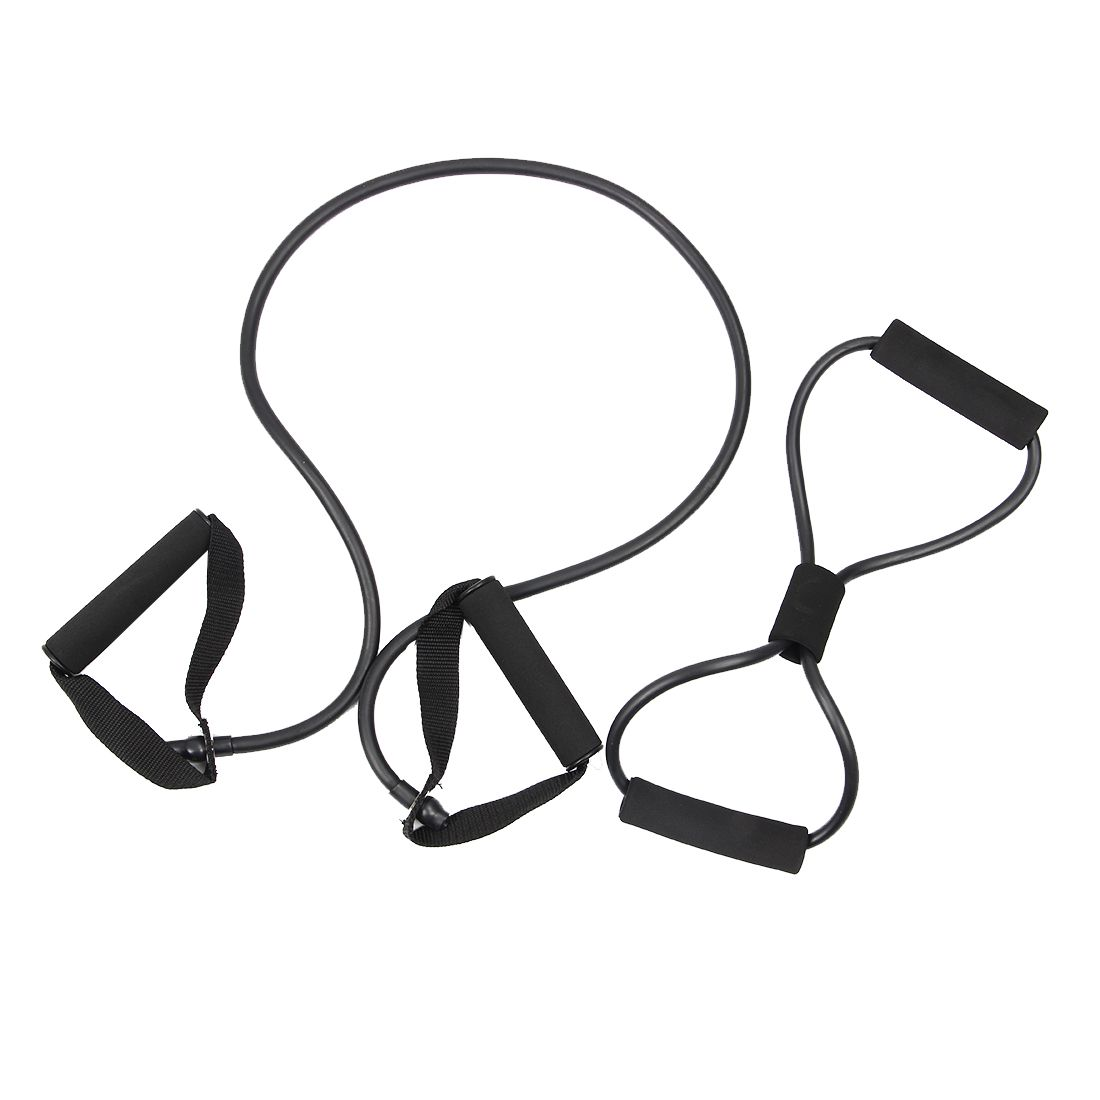 2 pcs Resistance bands chest developer chest expander Exercise Tubes,yoga Tube Training Rope spring exerciser Resistance tube